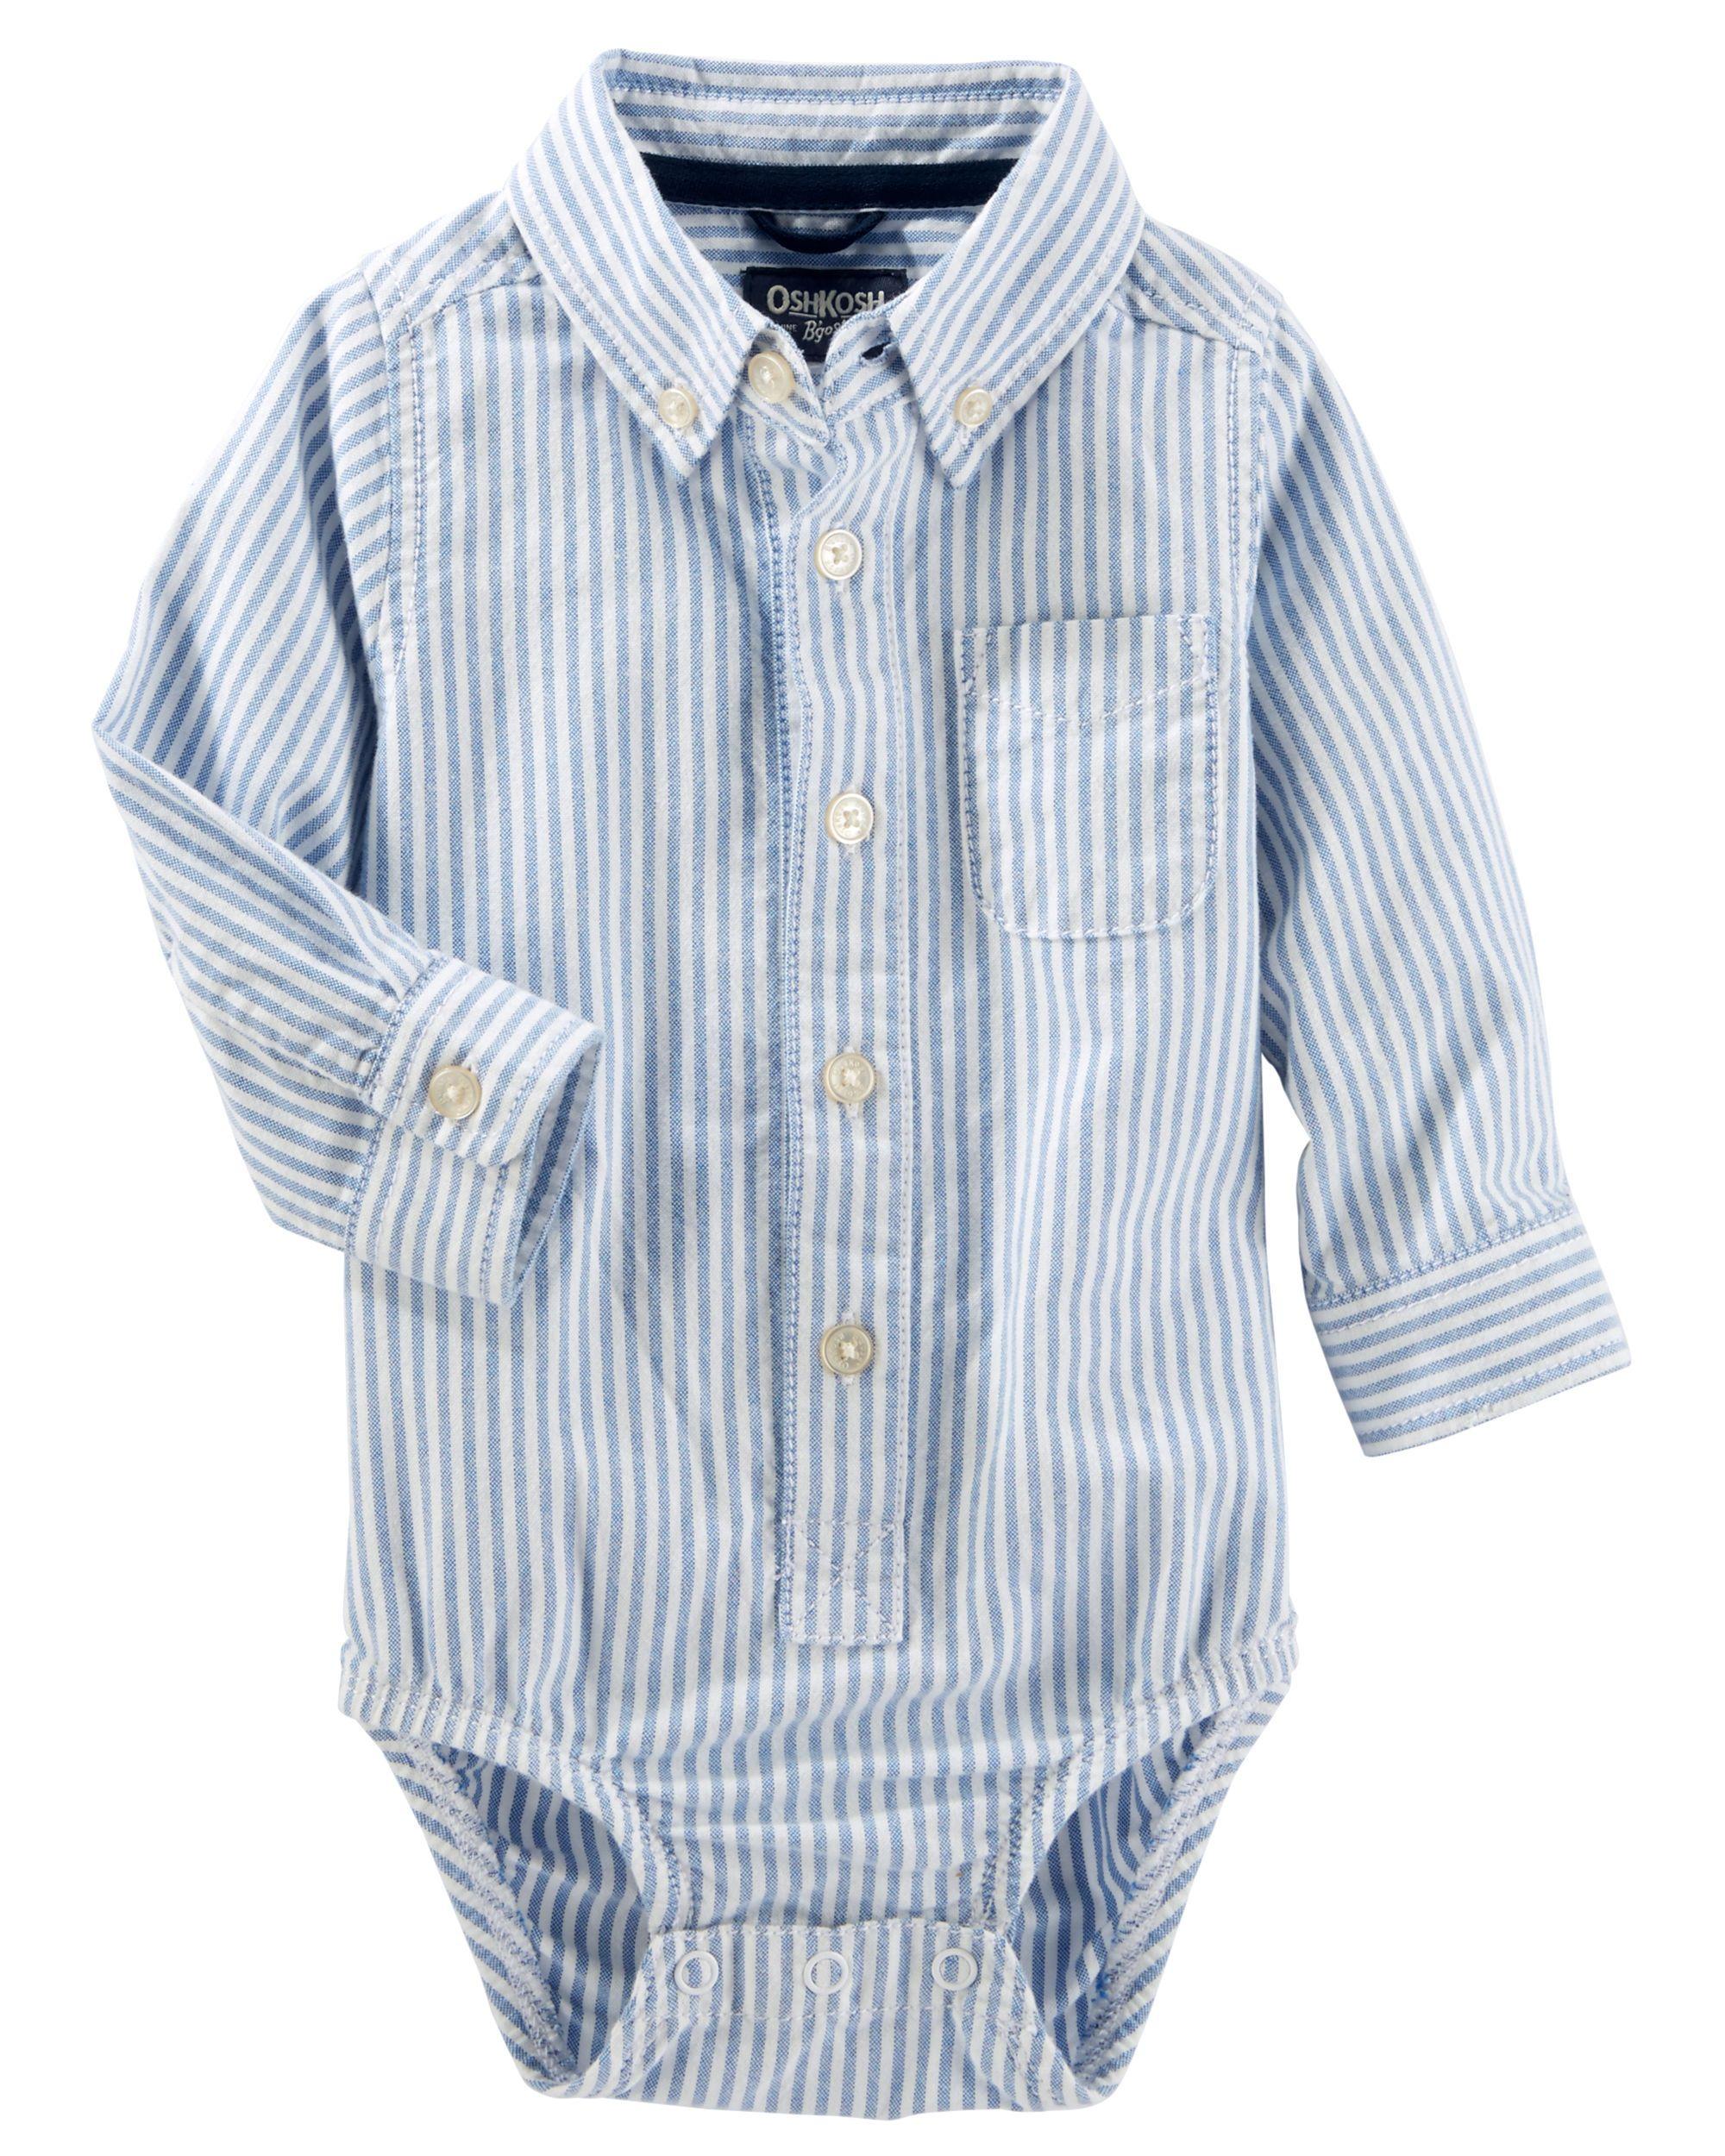 Striped Button front Oxford Bodysuit